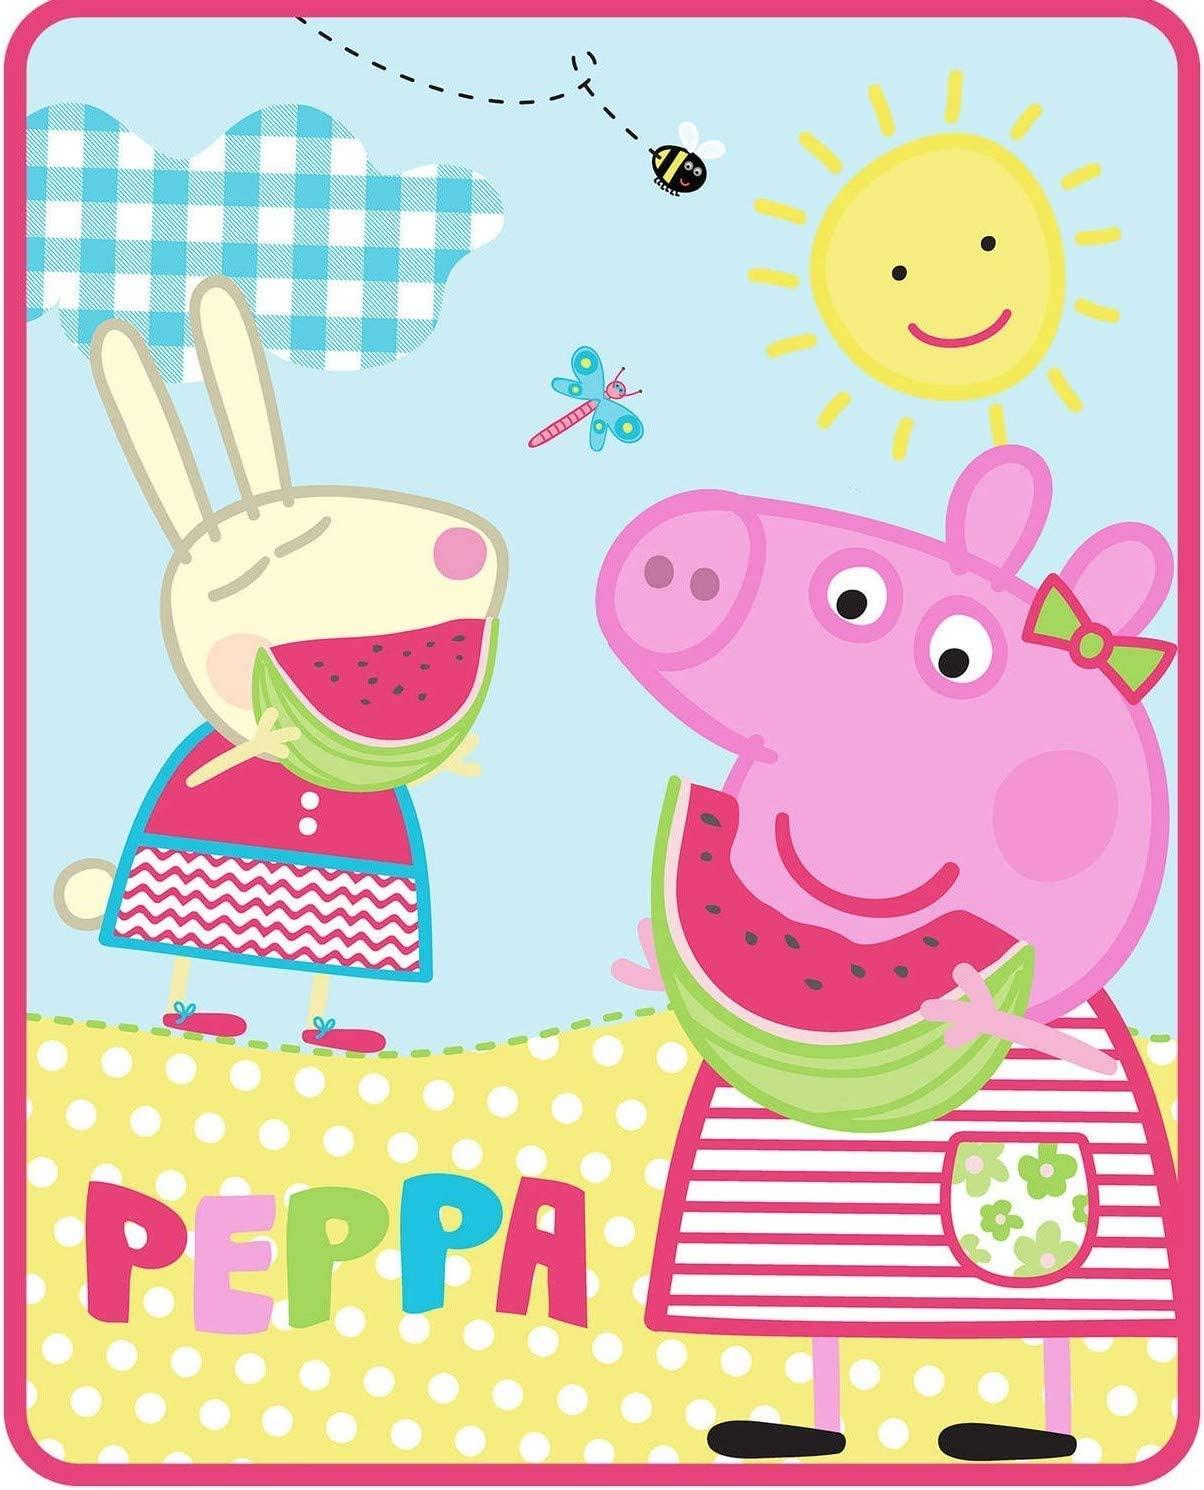 "FairyShe Peppa Pig Kids Fleece Blanket Cartoon Print Baby Throw Blanket,40"" x 55"" Soft Warm Plush Sheet for Crib Bed Living Room(Peppa Pig 40"